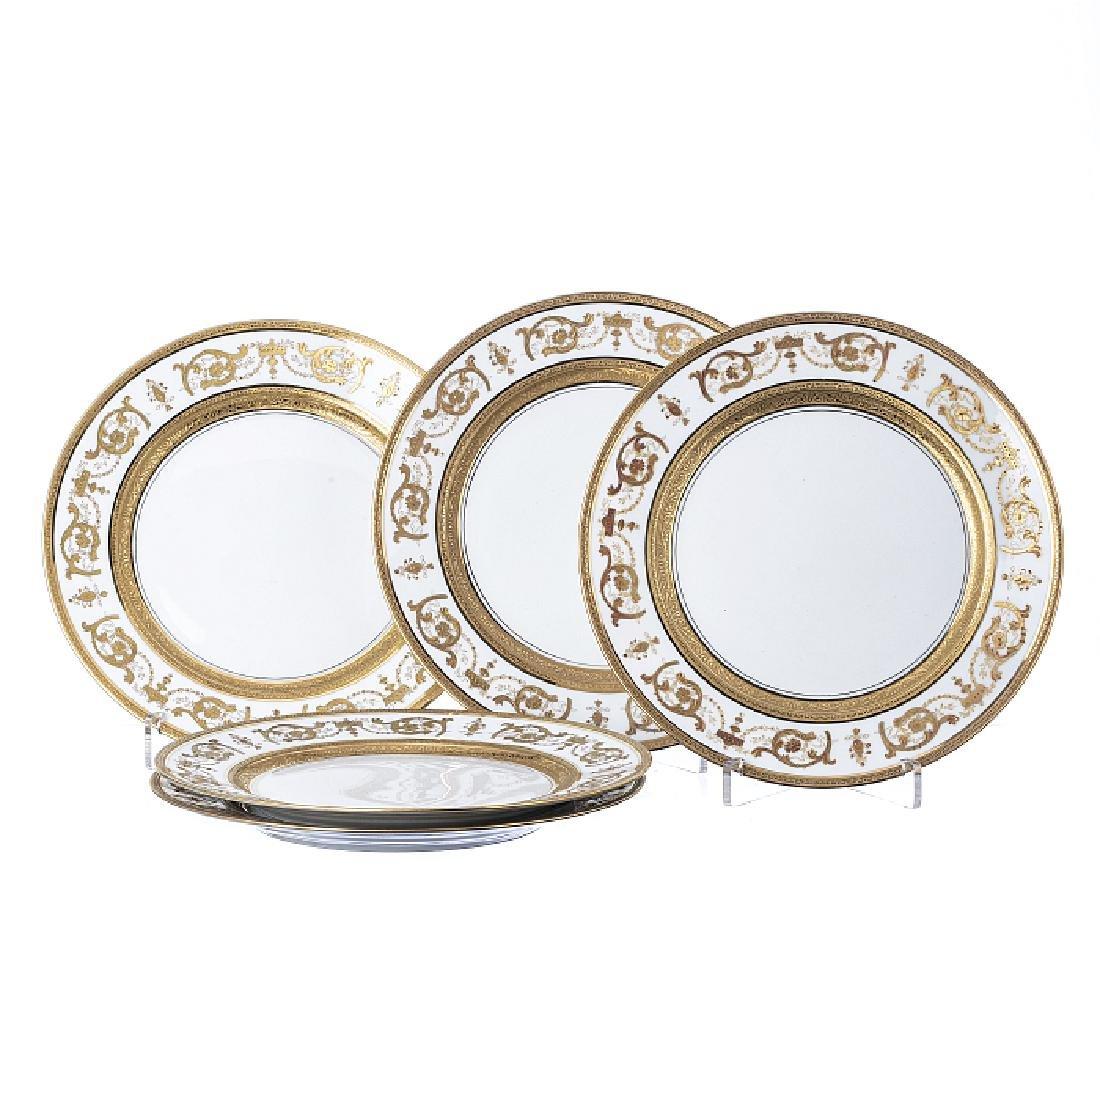 Five Imperator Or plates in Haviland porcelain